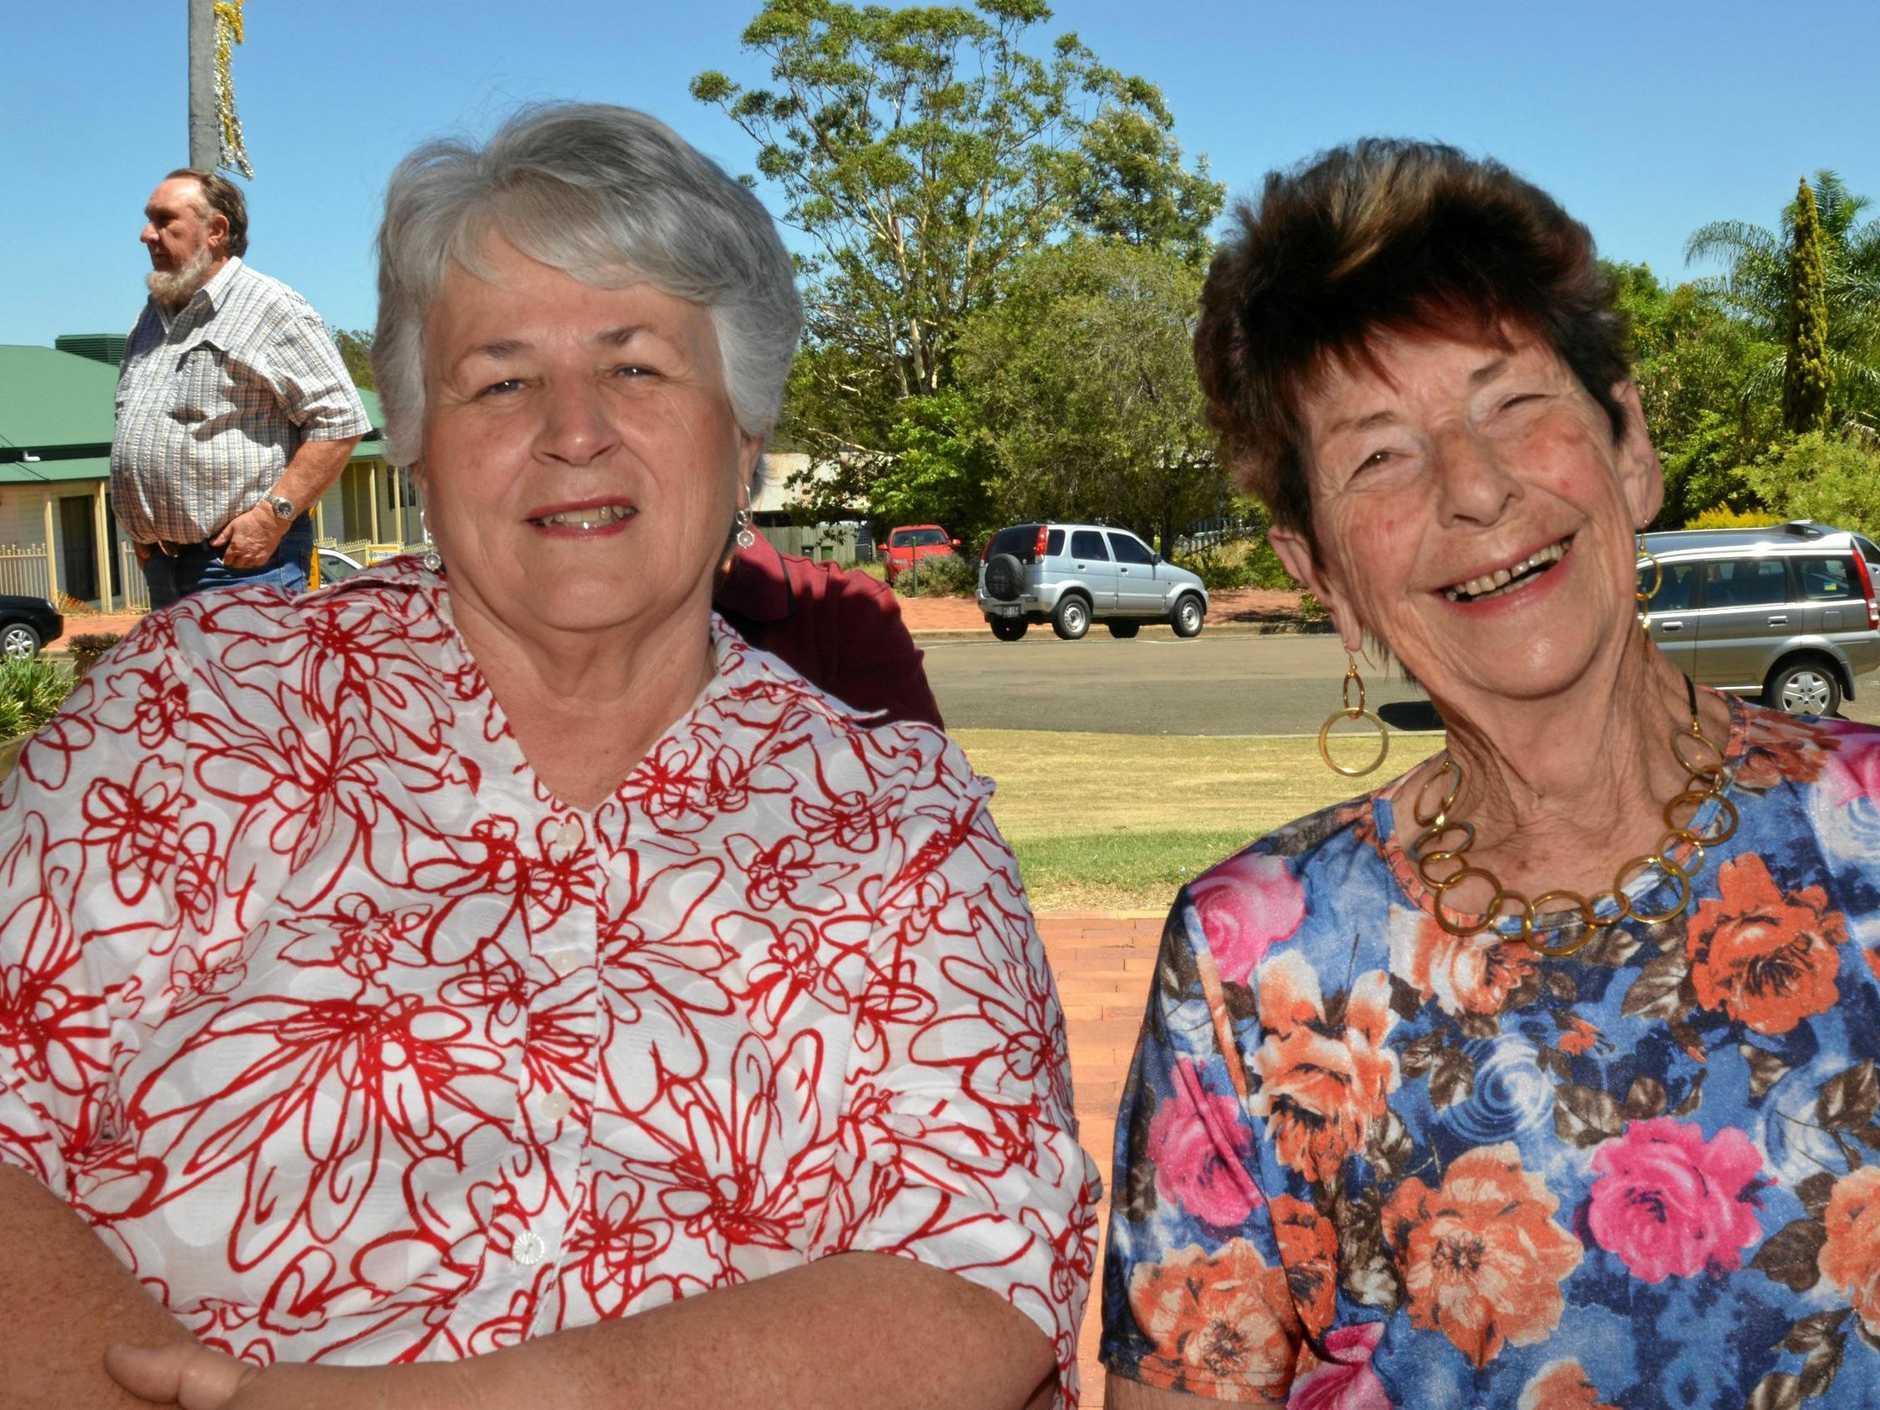 Alison Iszlaub, the wife of former Wondai mayor, the late Percy Iszlaub, passed away peacefully on Wednesday November 14, aged 82 years old.